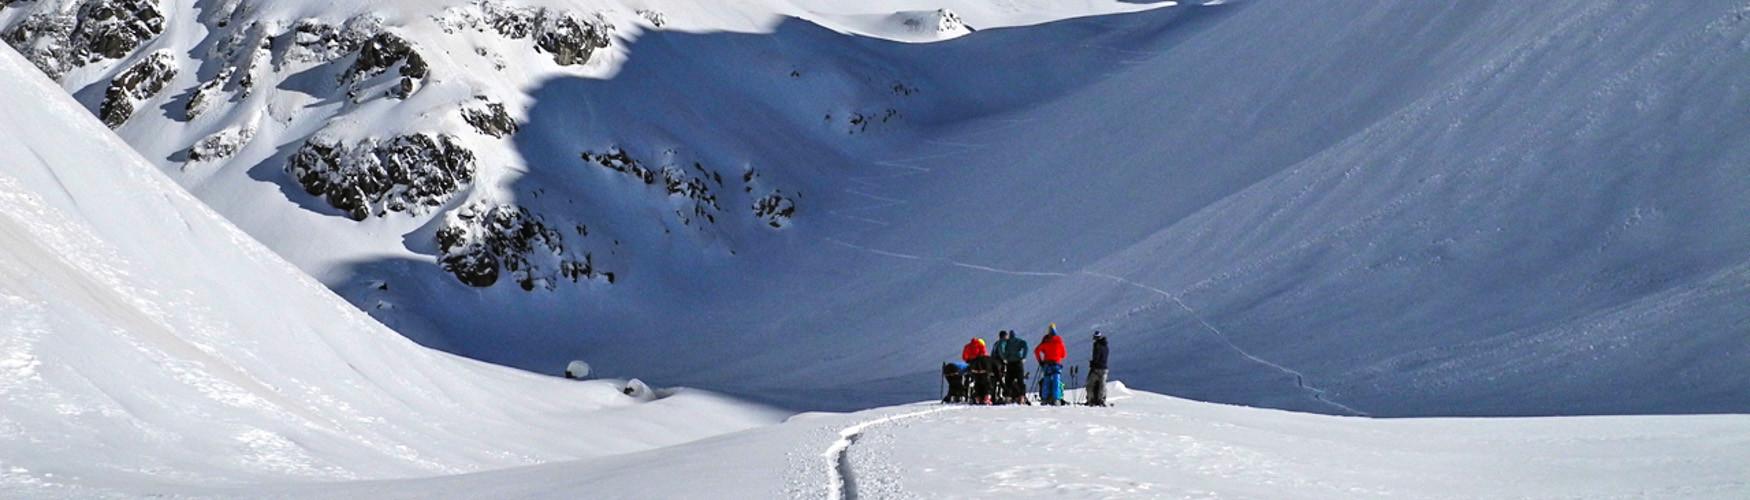 Skitour Transalp, Alpenüberquerung Ski, Bergführer Alpenüberquerung Skitour